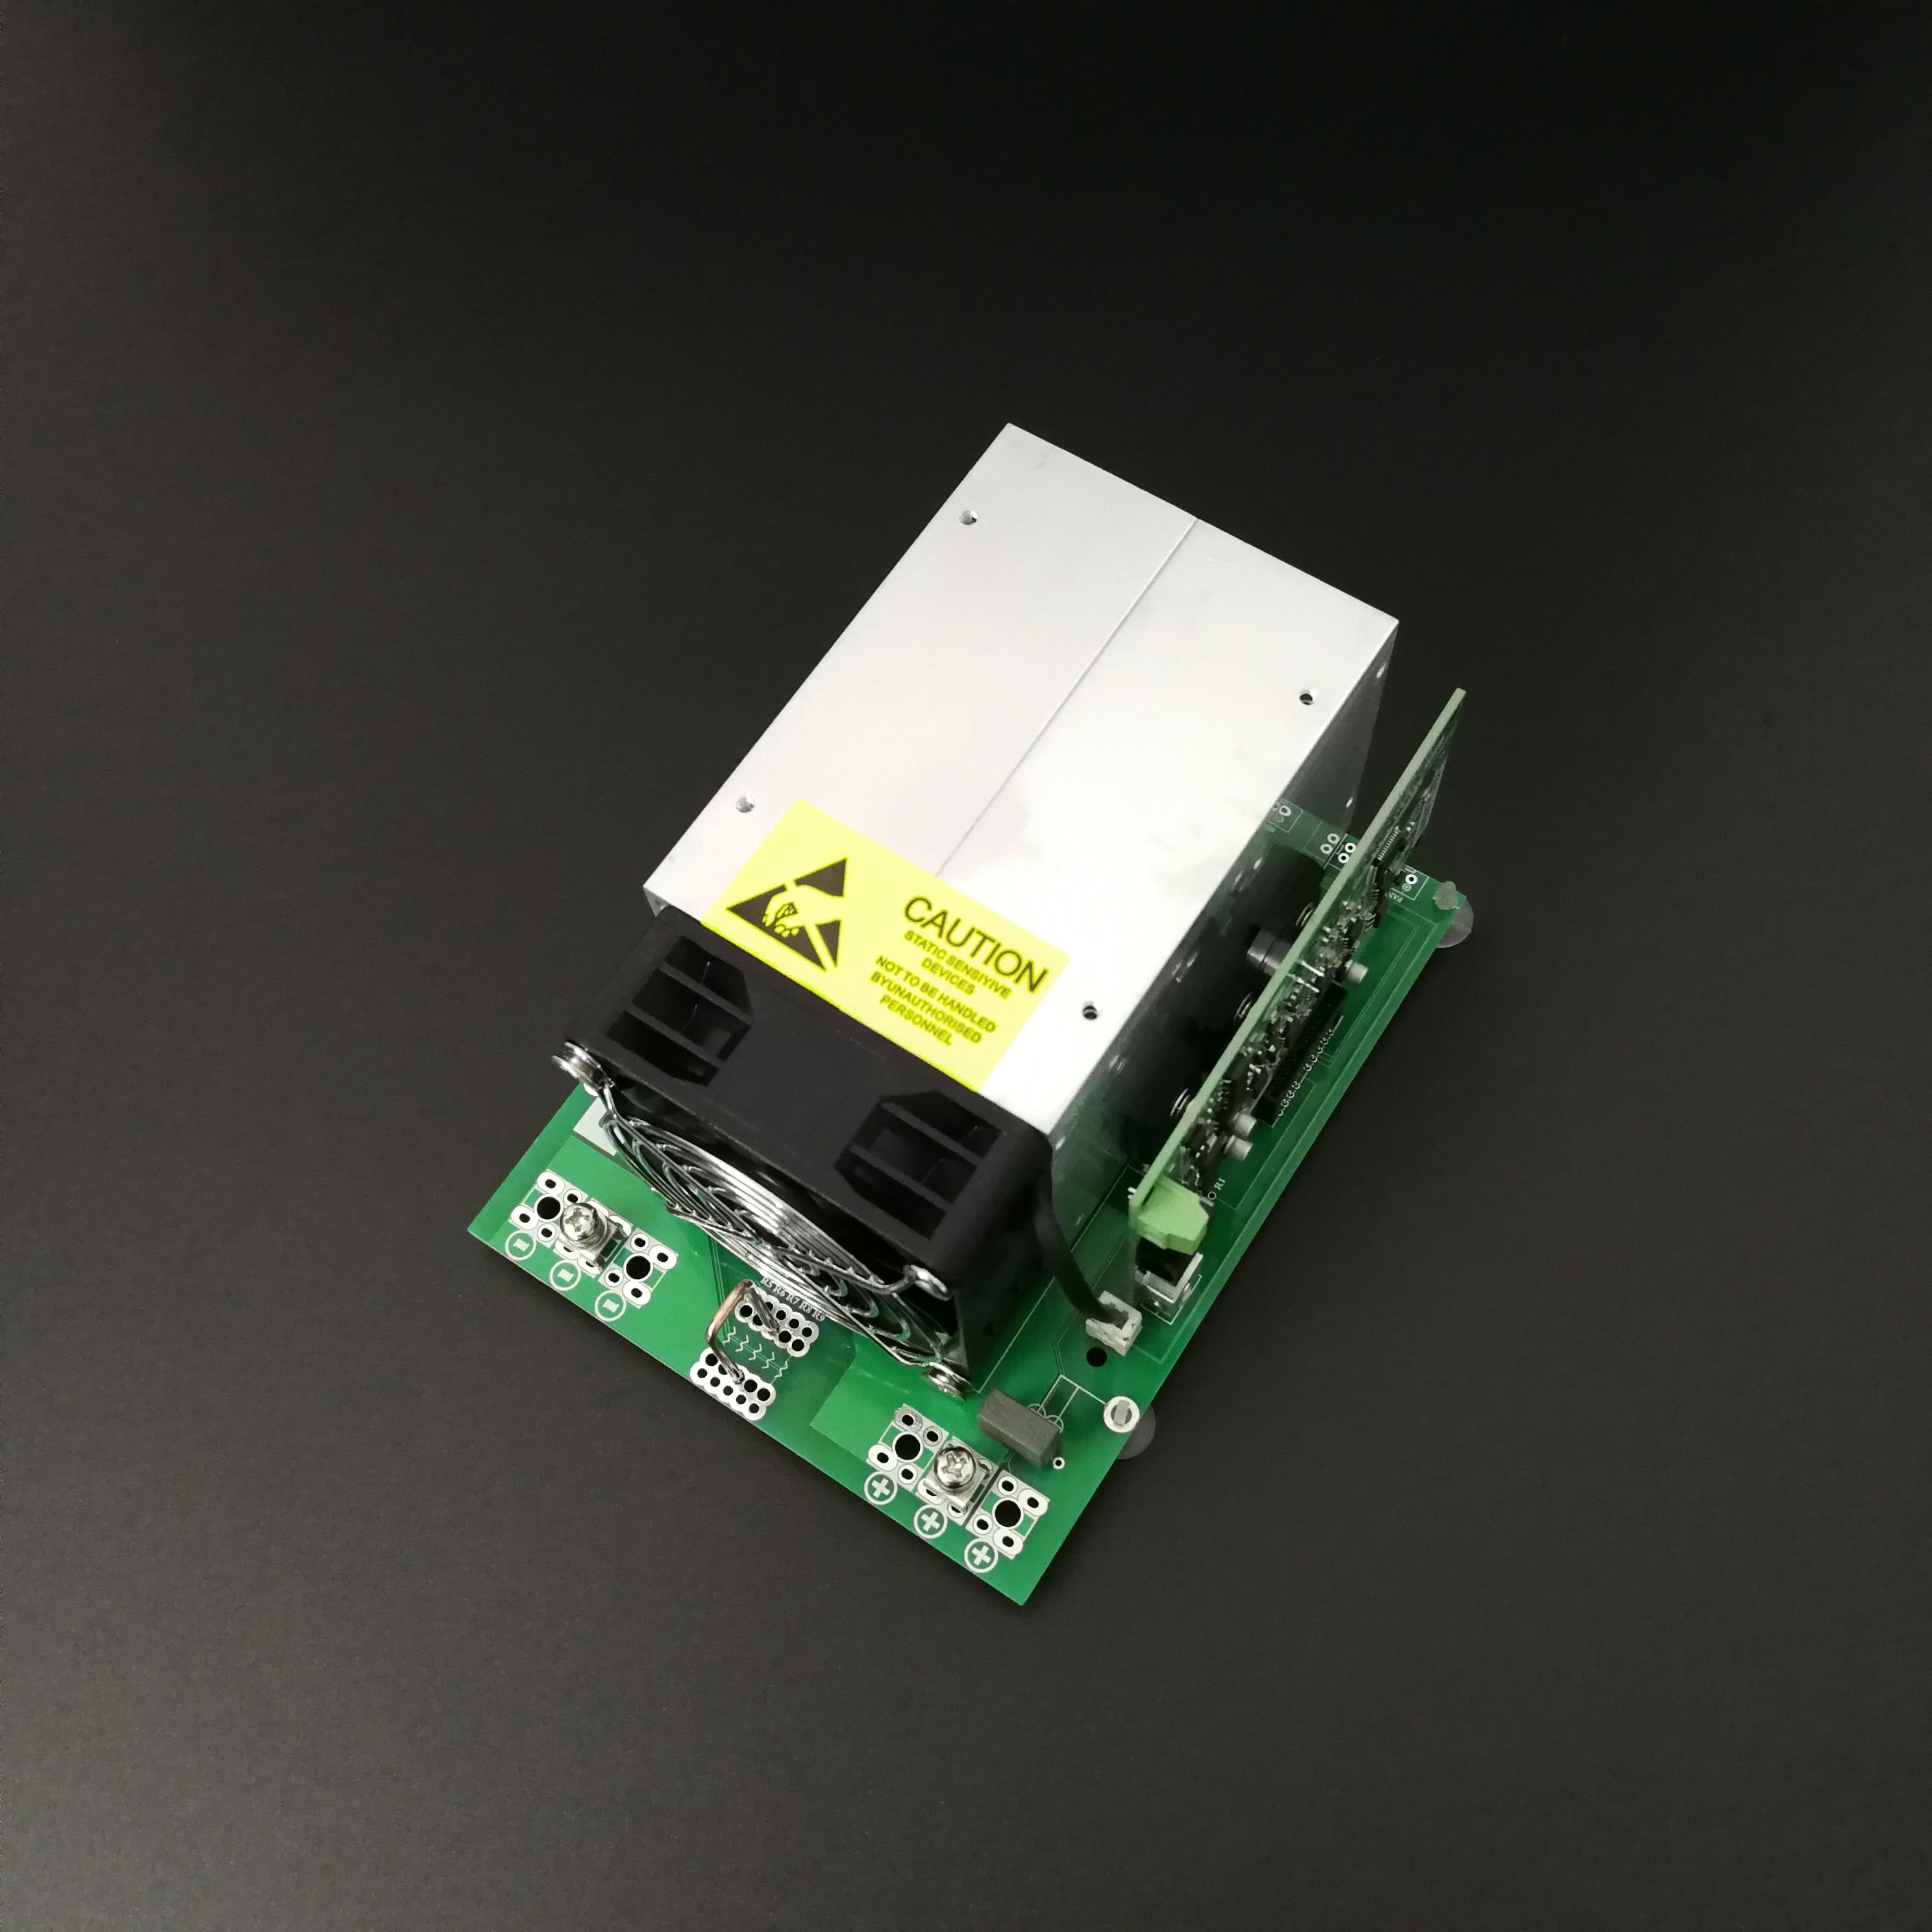 Carga electrónica programada carga voltaje constante corriente fija resistencia fija CNC carga de comunicación 300W